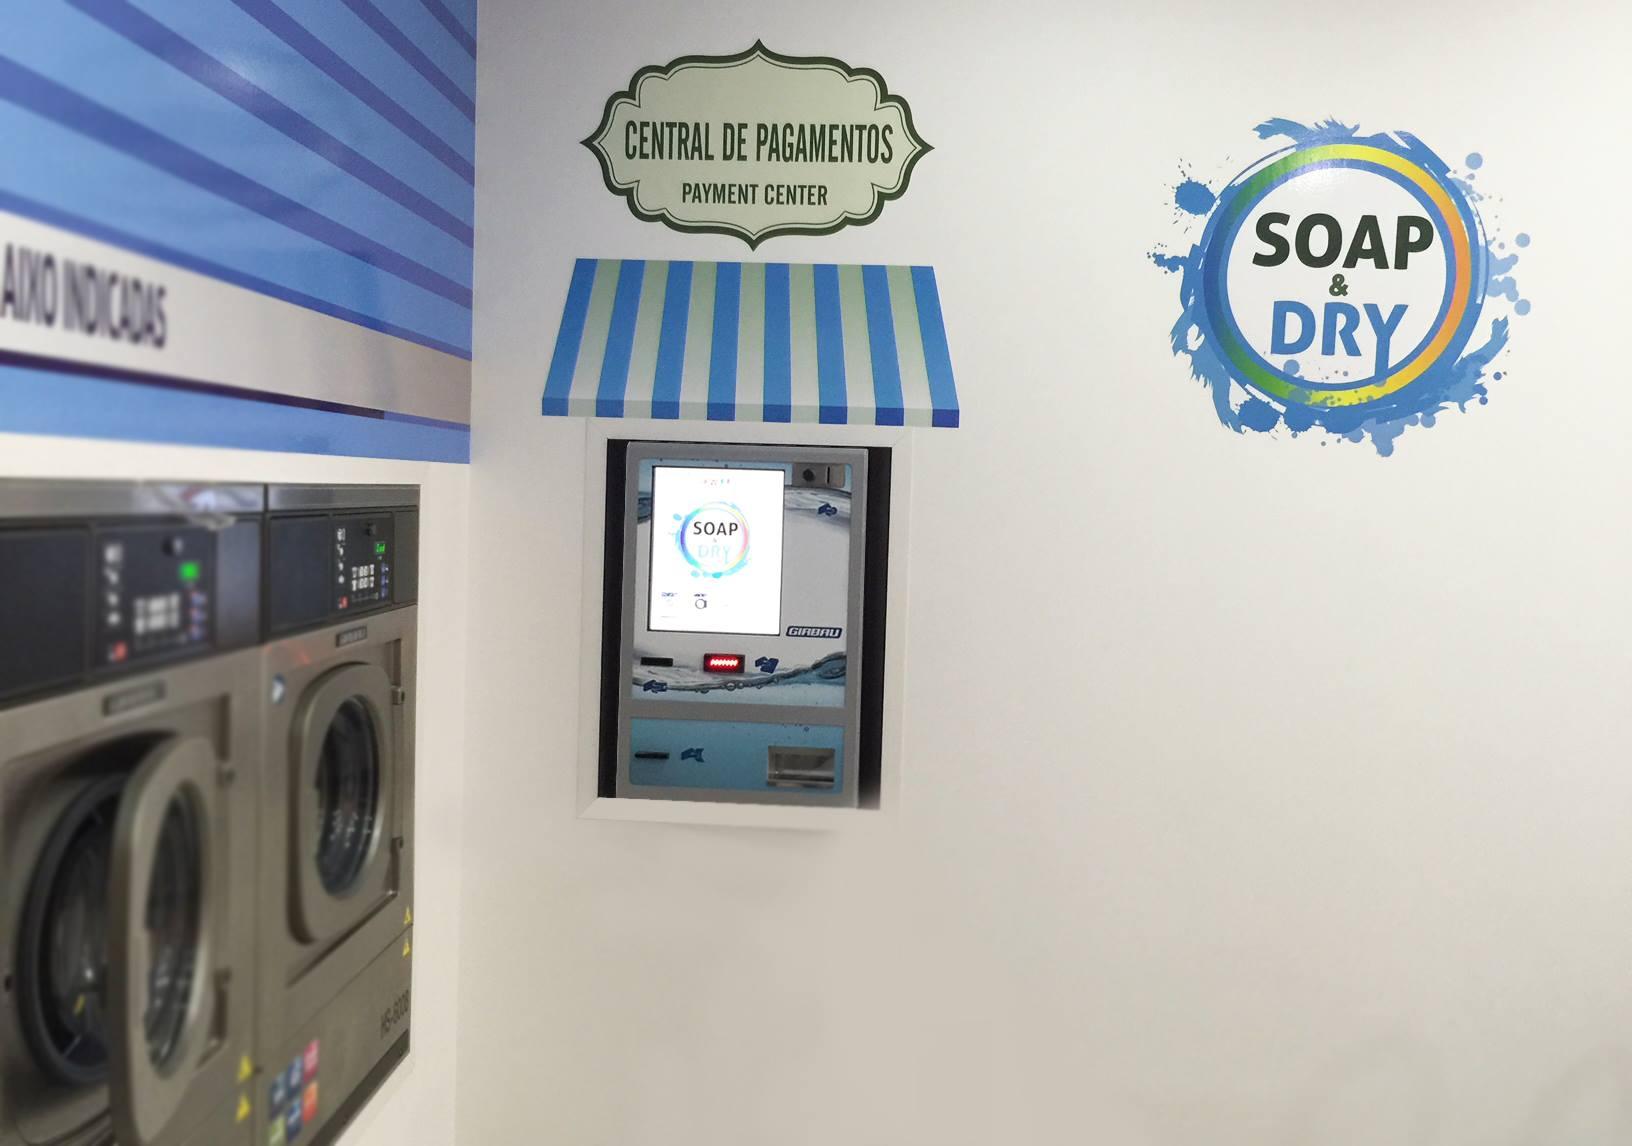 soap-dry-interior-pagamentos